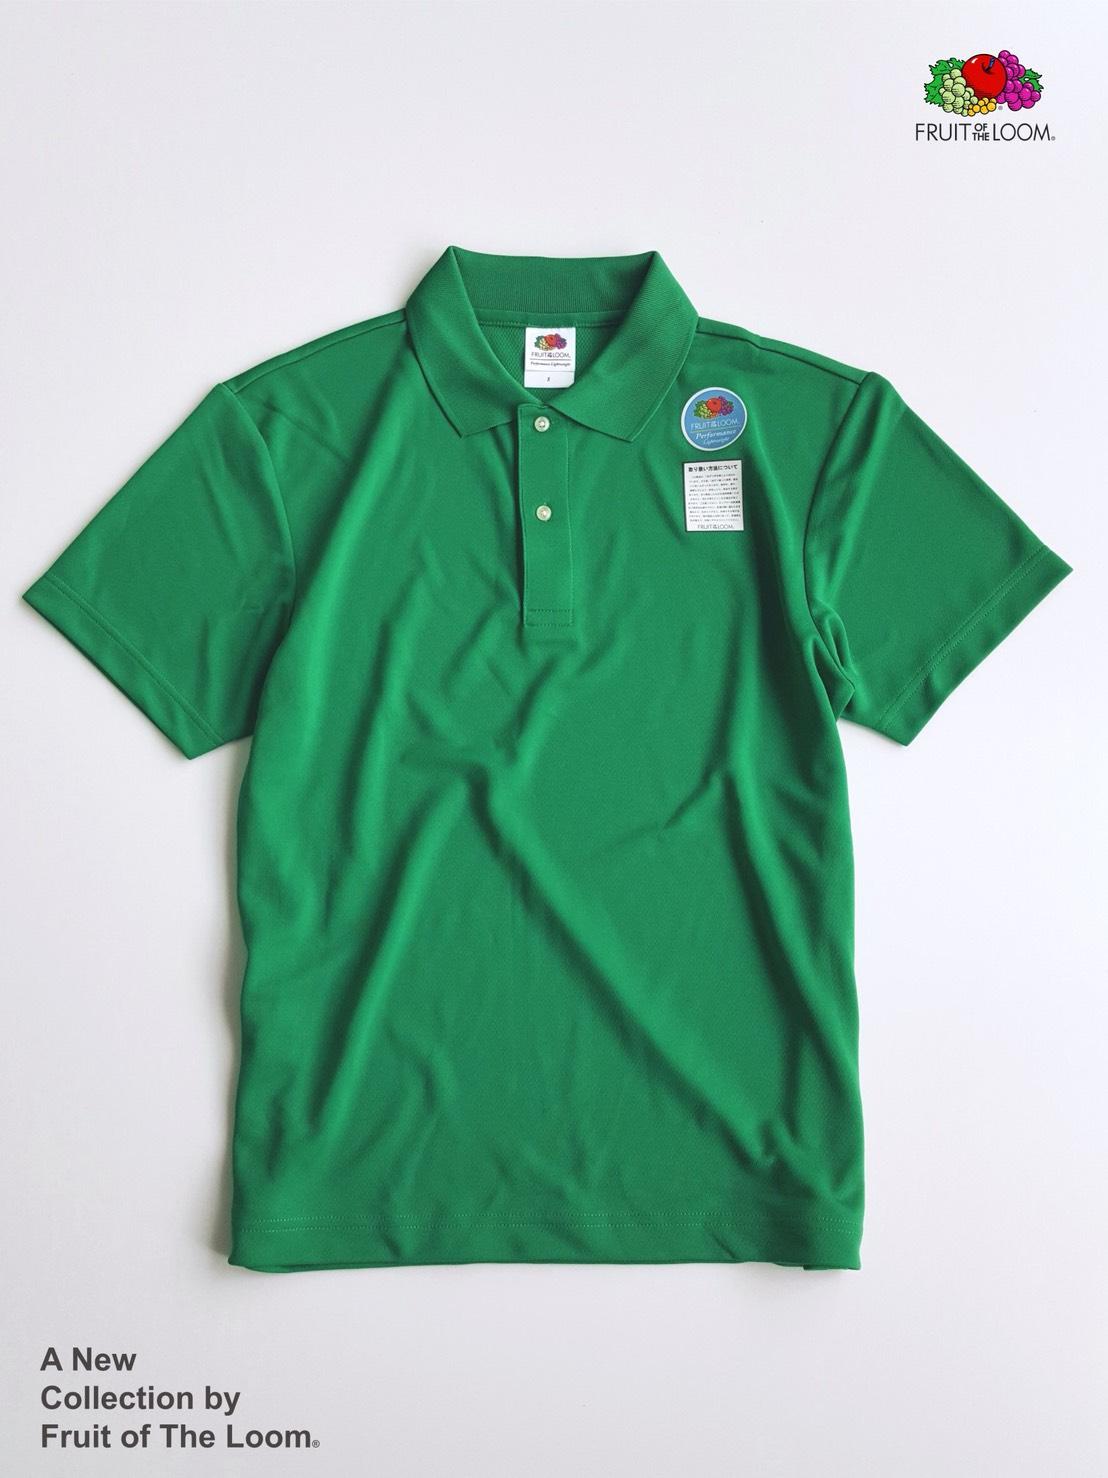 FRUIT OF THE LOOM 水果牌 - DYP9000 吸濕排汗 4.1OZ 短袖 POLO衫 (GR綠色)